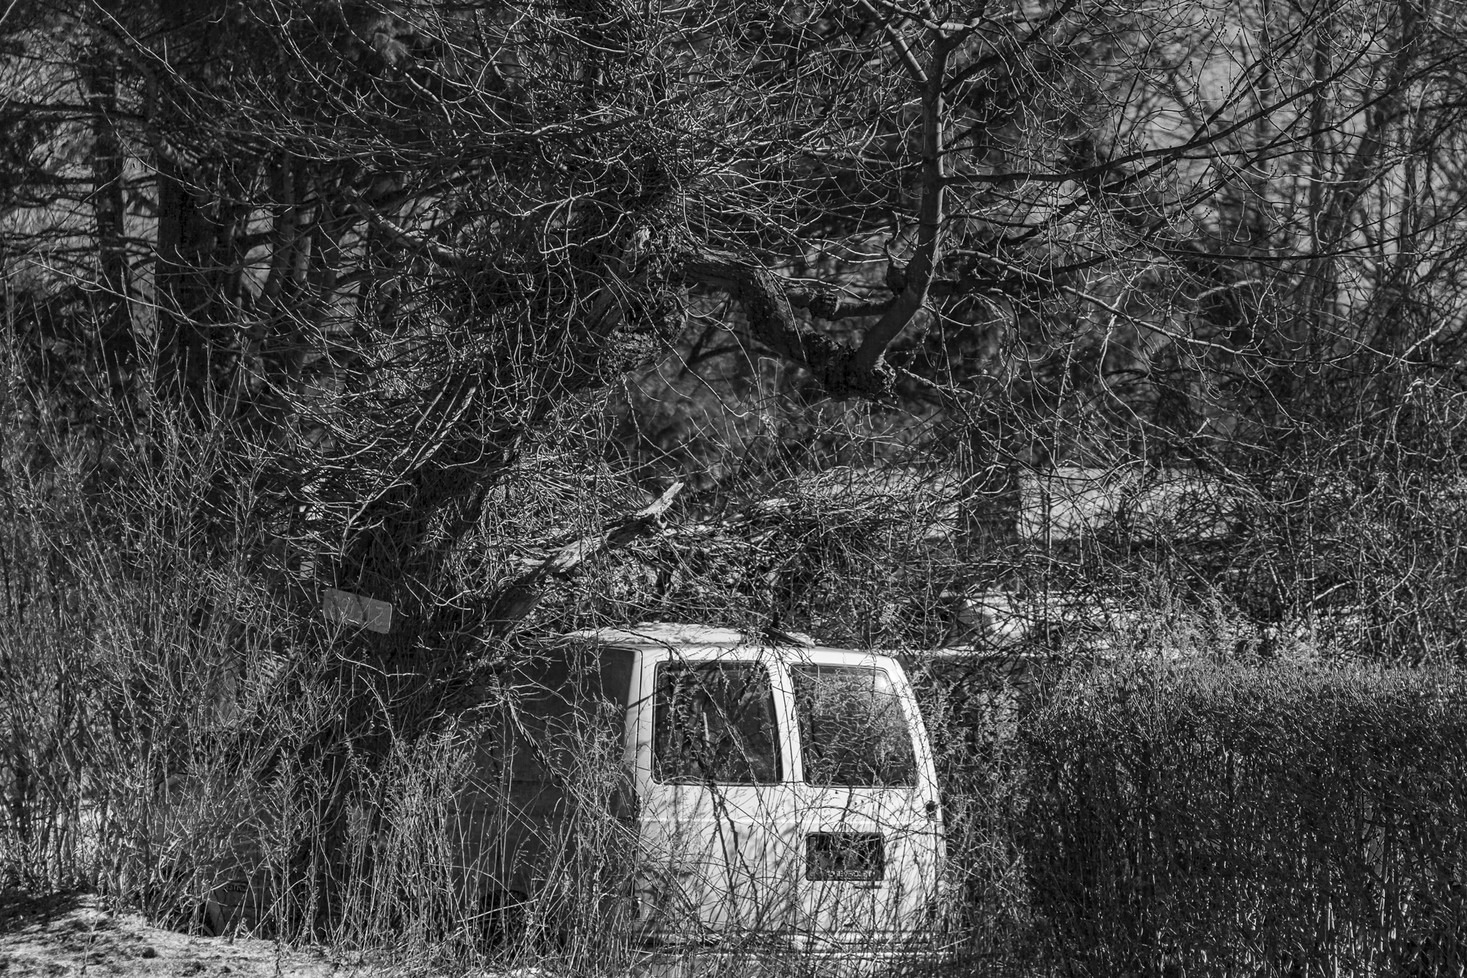 Van in Tree